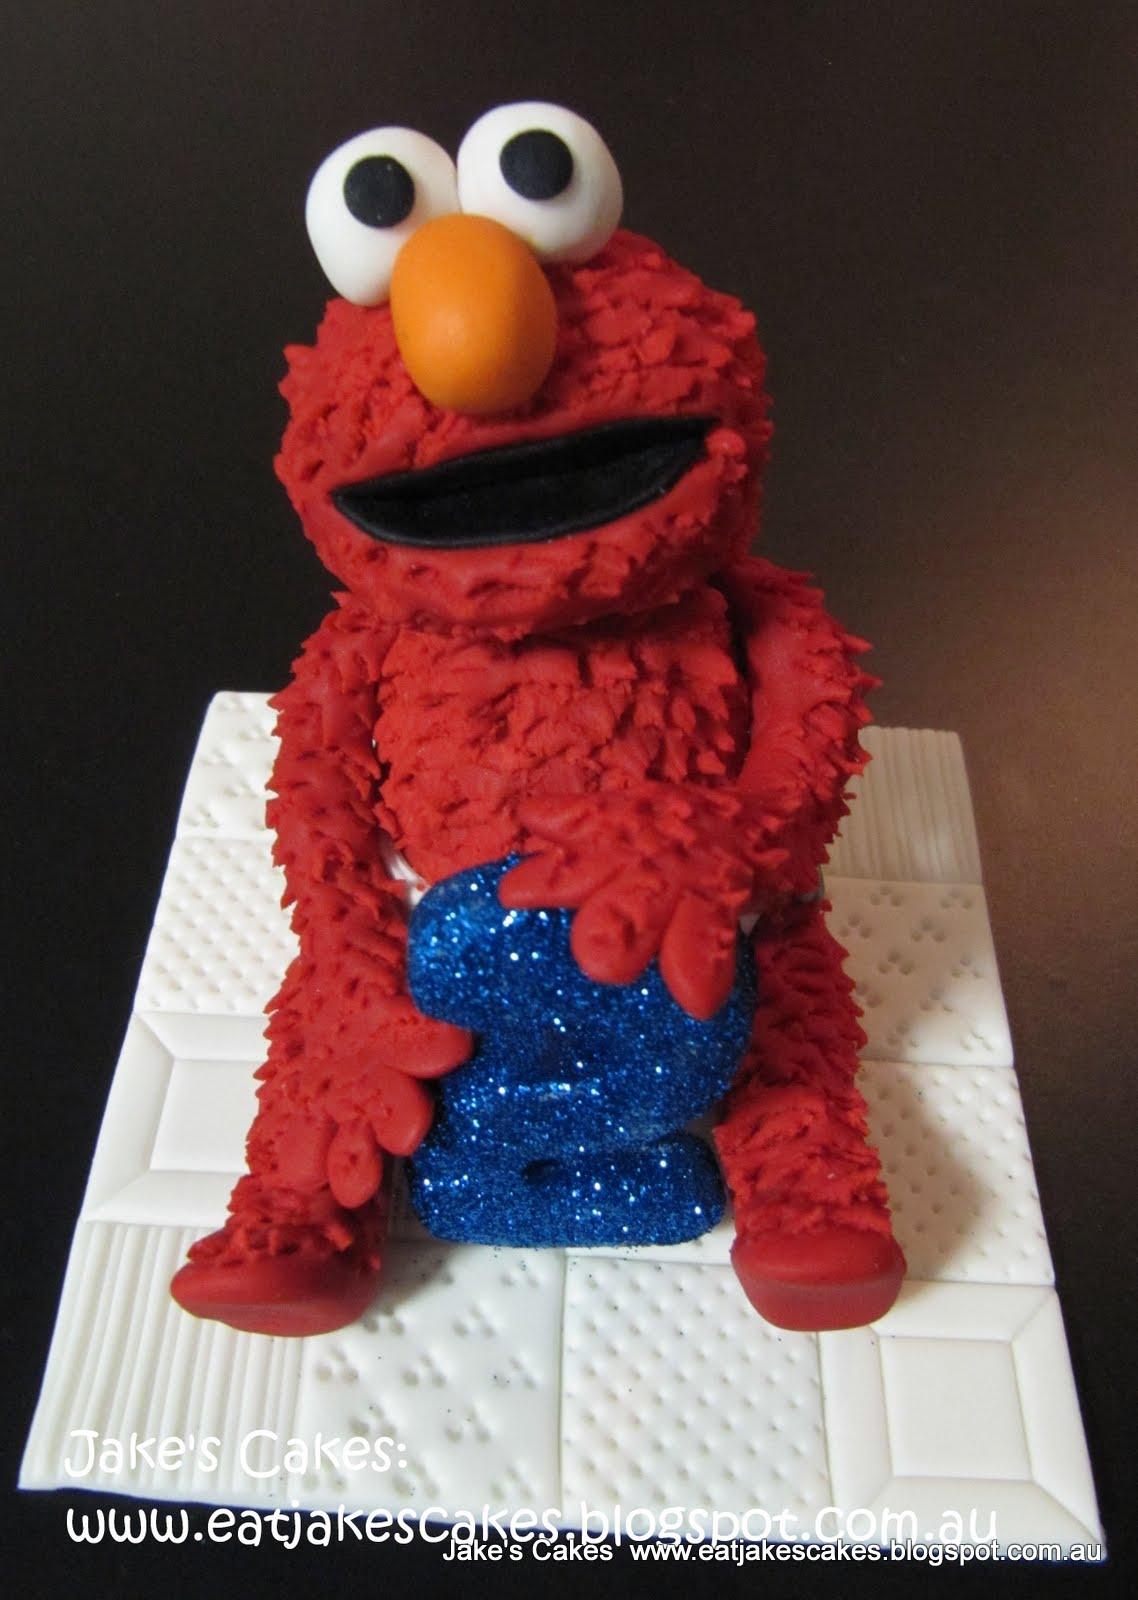 Elmo Cake Decorations : Jake s Cakes: Fondant Elmo cake topper